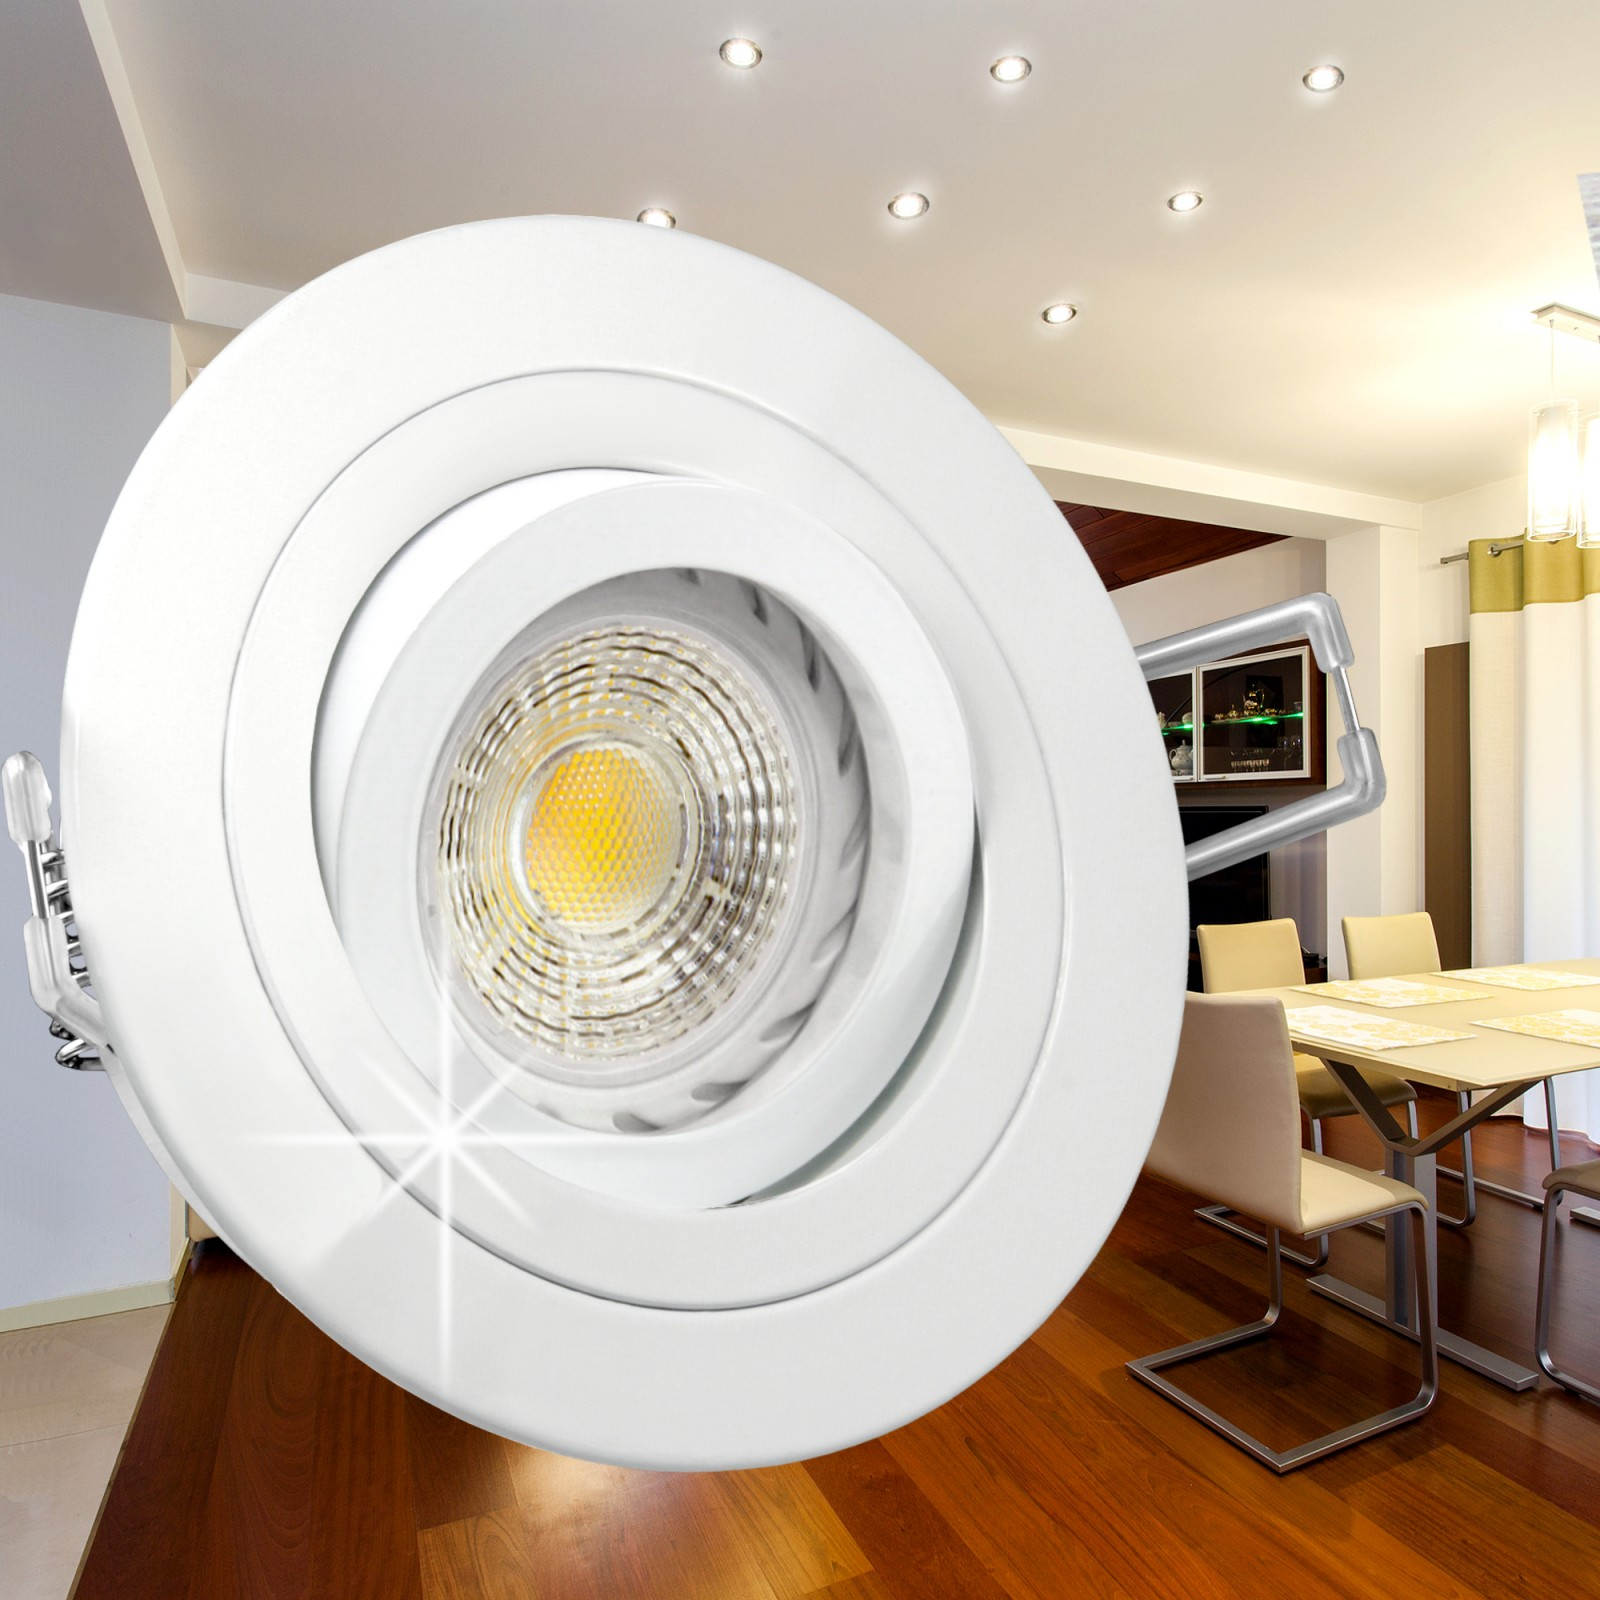 rf 2 led einbauspot strahler wei schwenkbar 3 5w smd led warmweiss gu10 230v ebay. Black Bedroom Furniture Sets. Home Design Ideas